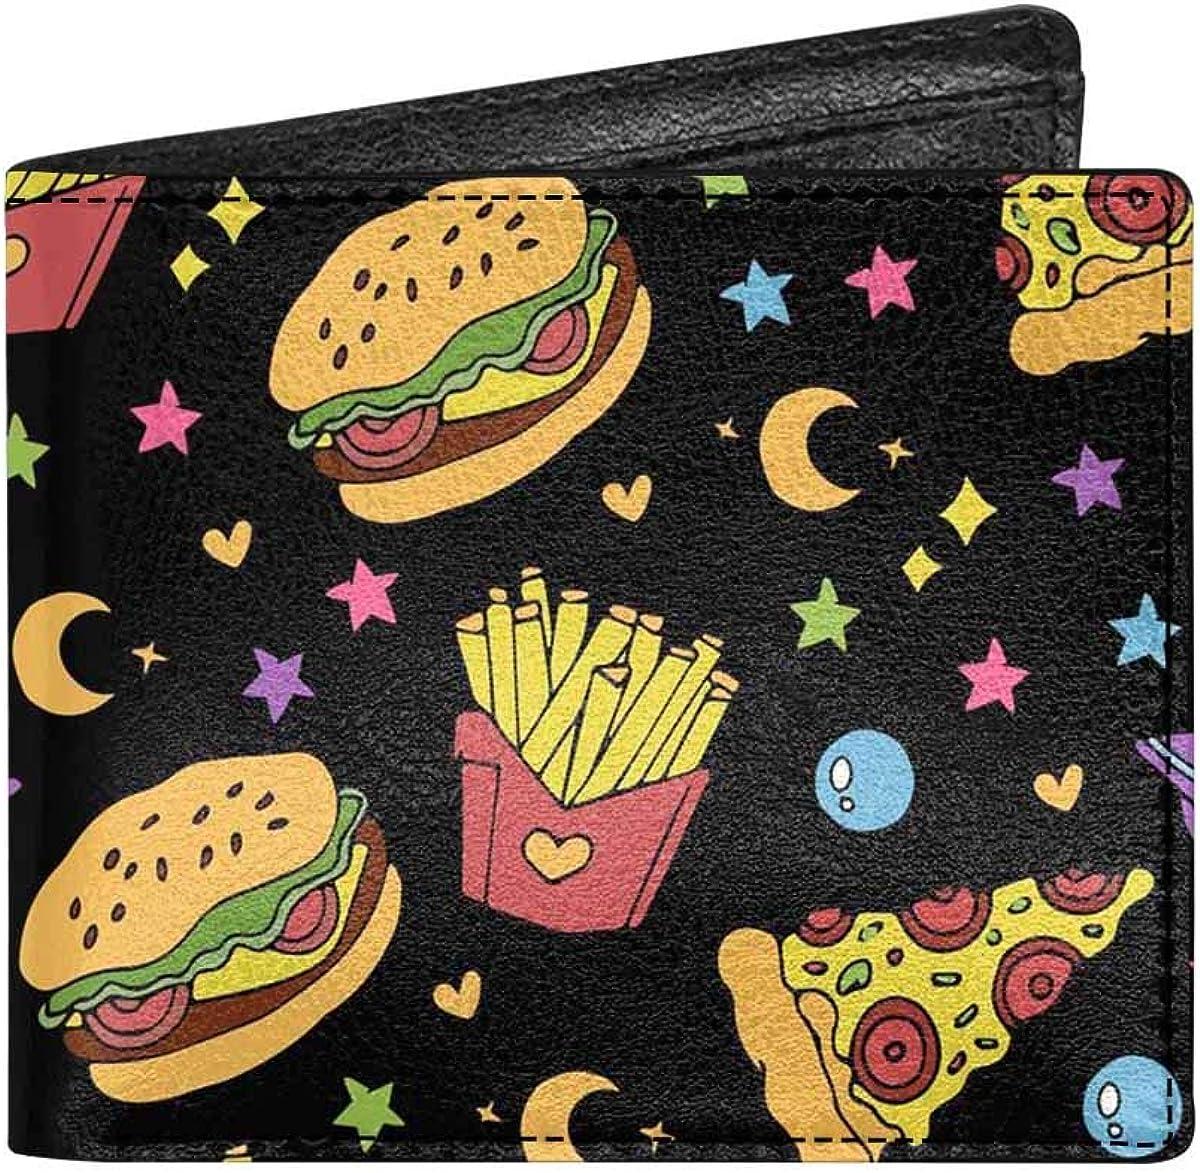 INTERESTPRINT Pizza Slice Doodles Classic PU Leather Bifold Wallet Coin Pocket Purse for Men, Women